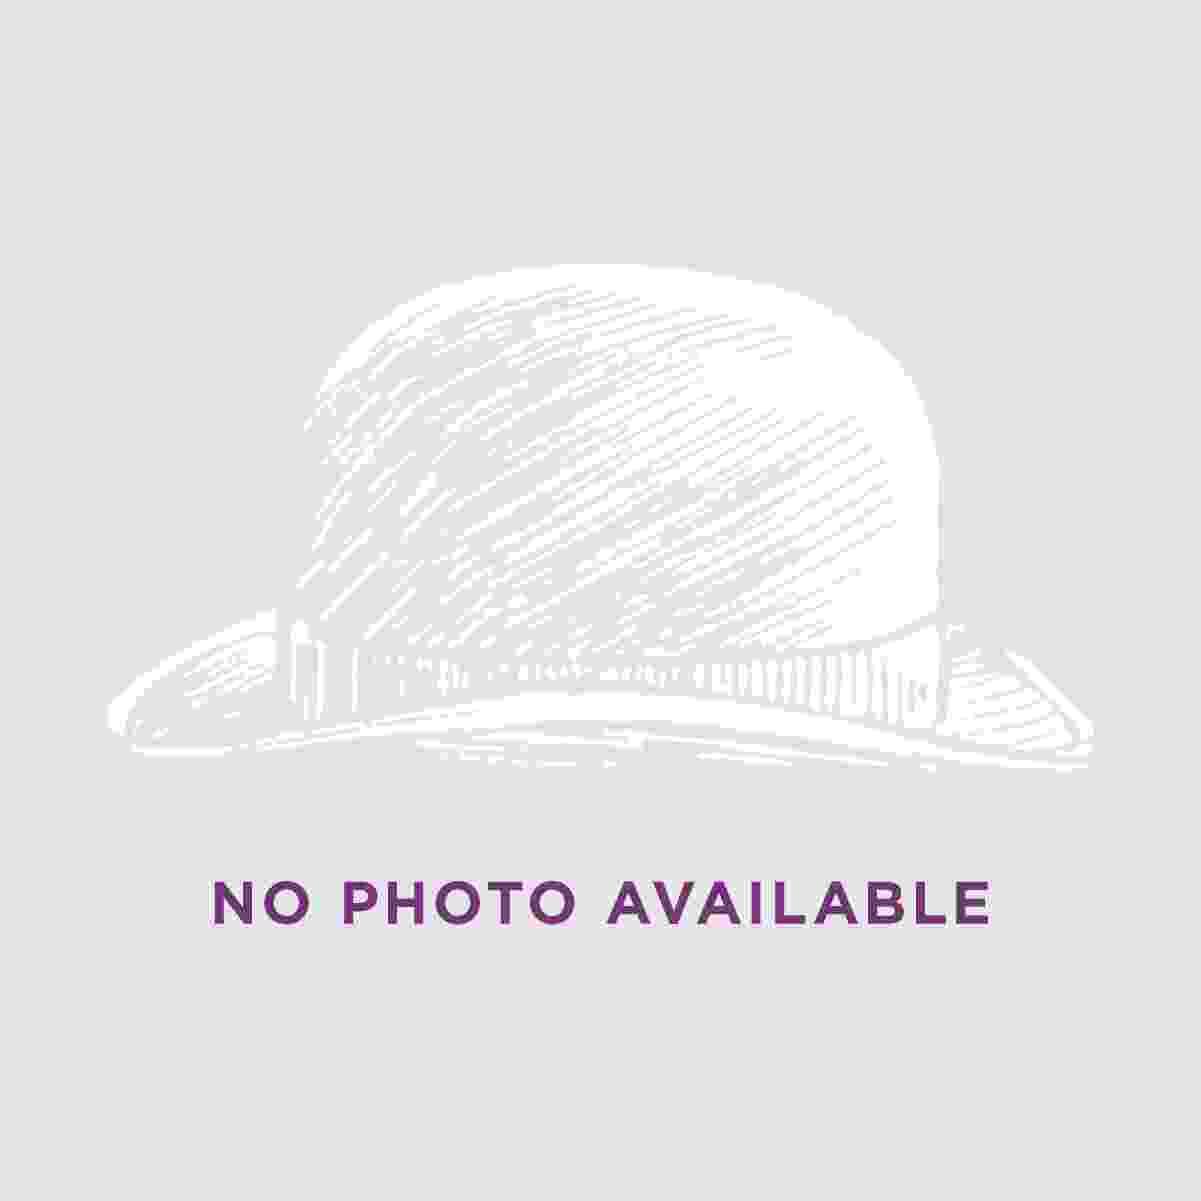 Hills Hats of New Zealand Baker Boy Tweed Newsboy cap